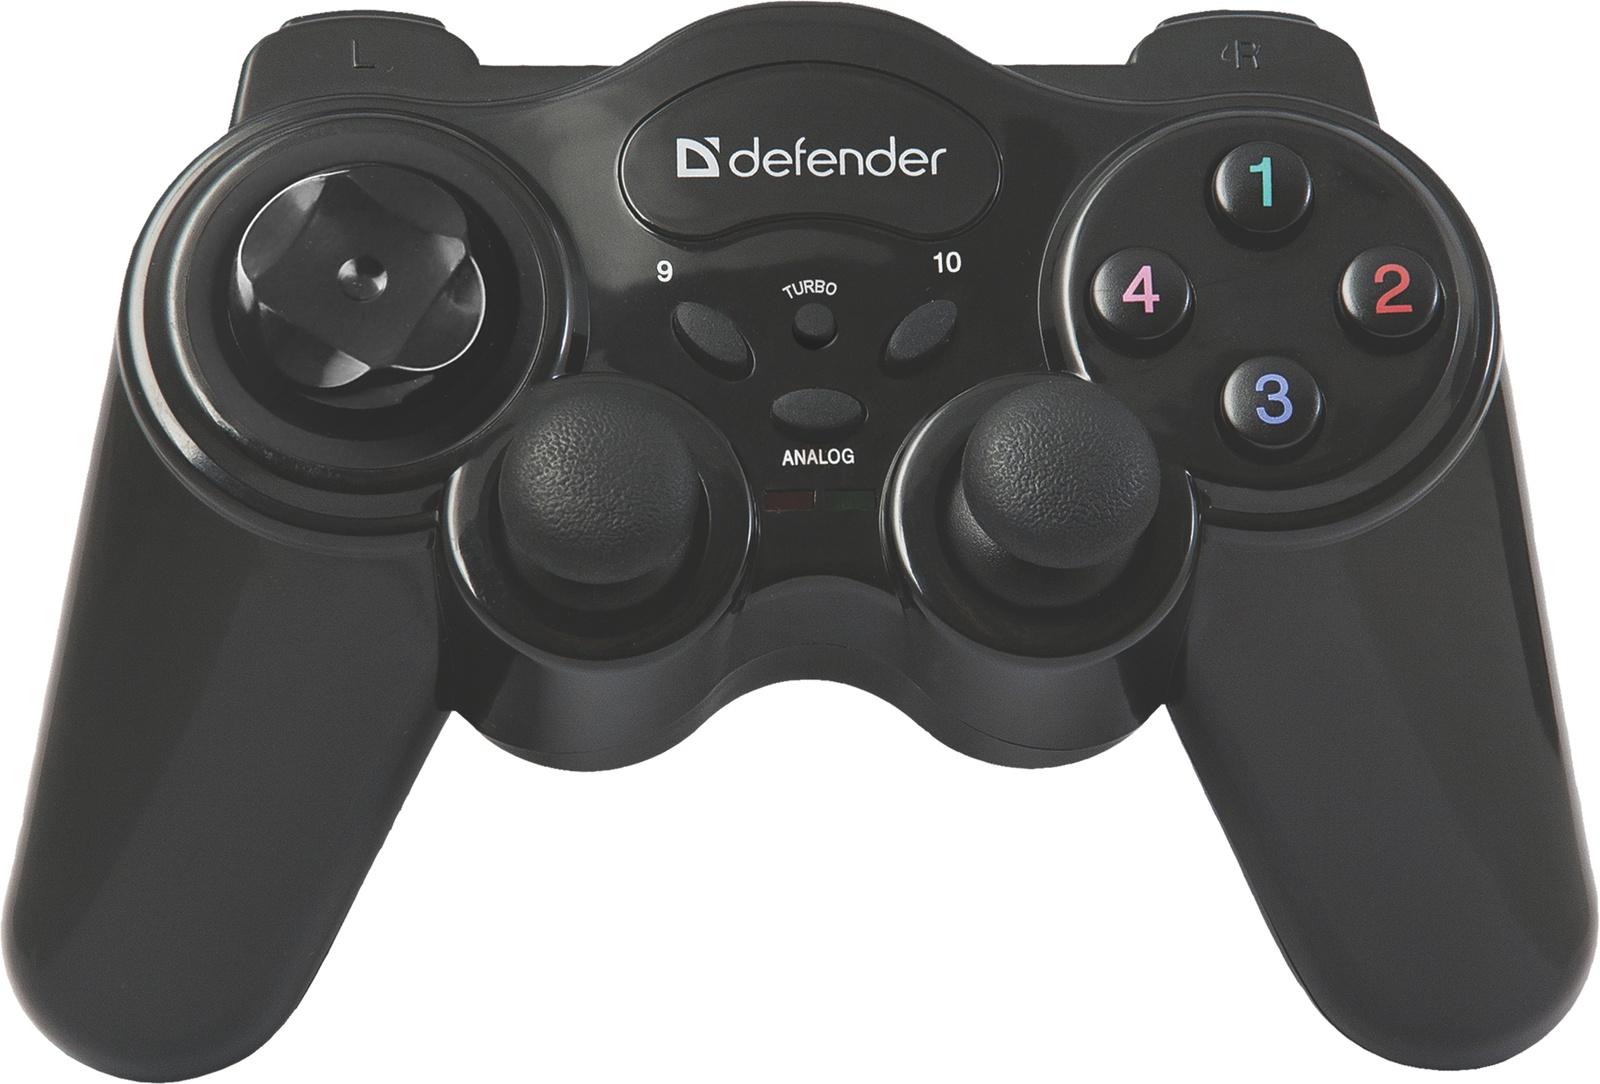 Беспроводной геймпад Defender Game Master Wireless USB, радио, 12 кнопок, 2 стика цена 2017